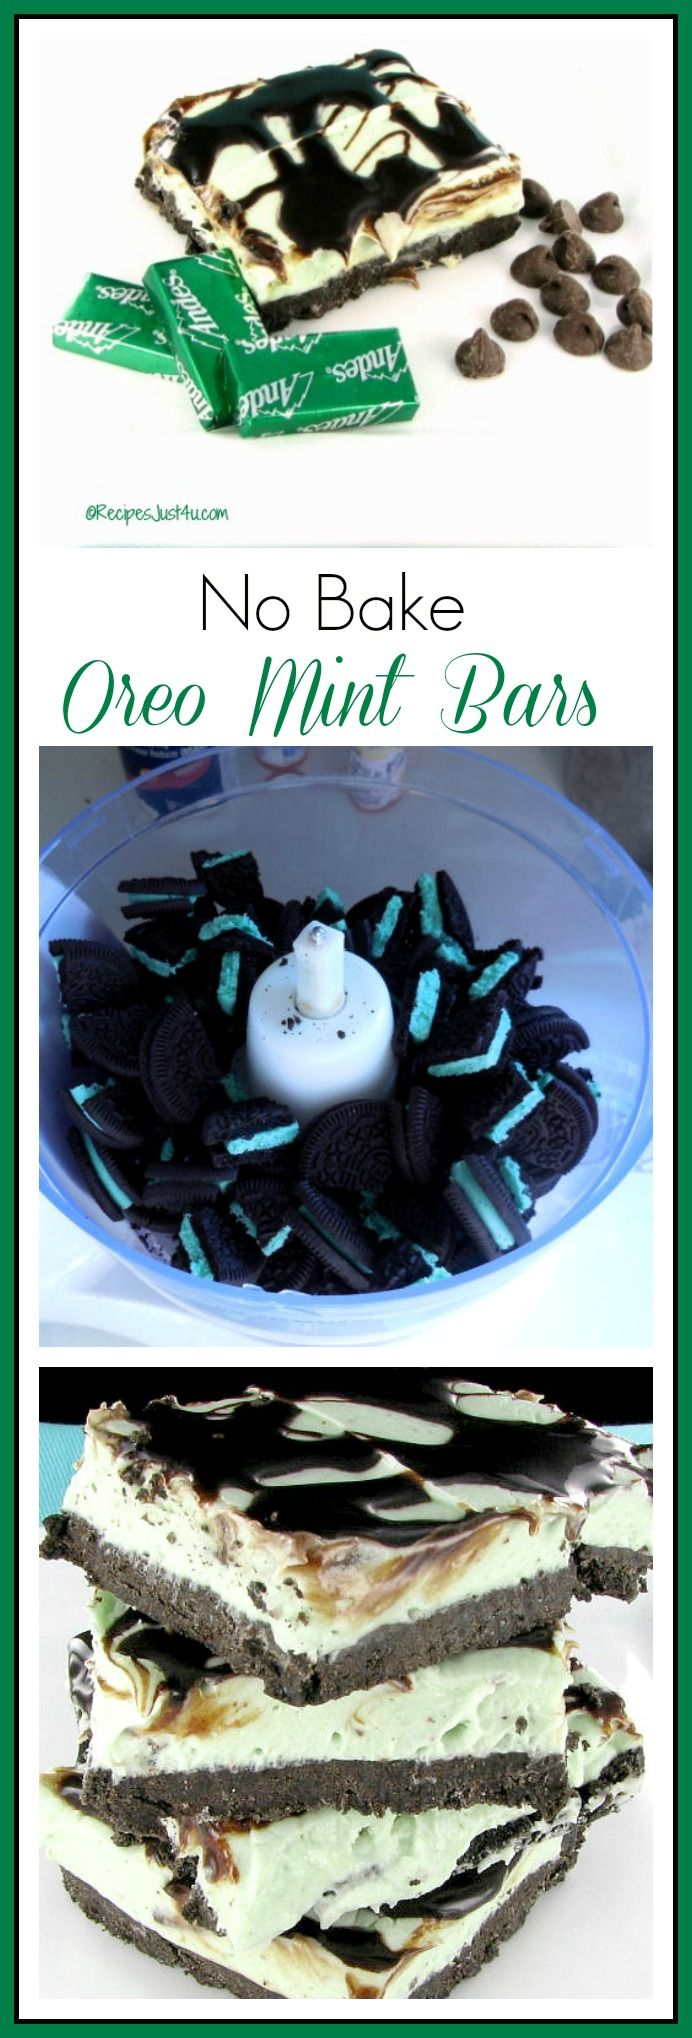 These no bake Oreo mint cheese cake bars have a delightful fresh mint taste - recipesjust4u.com